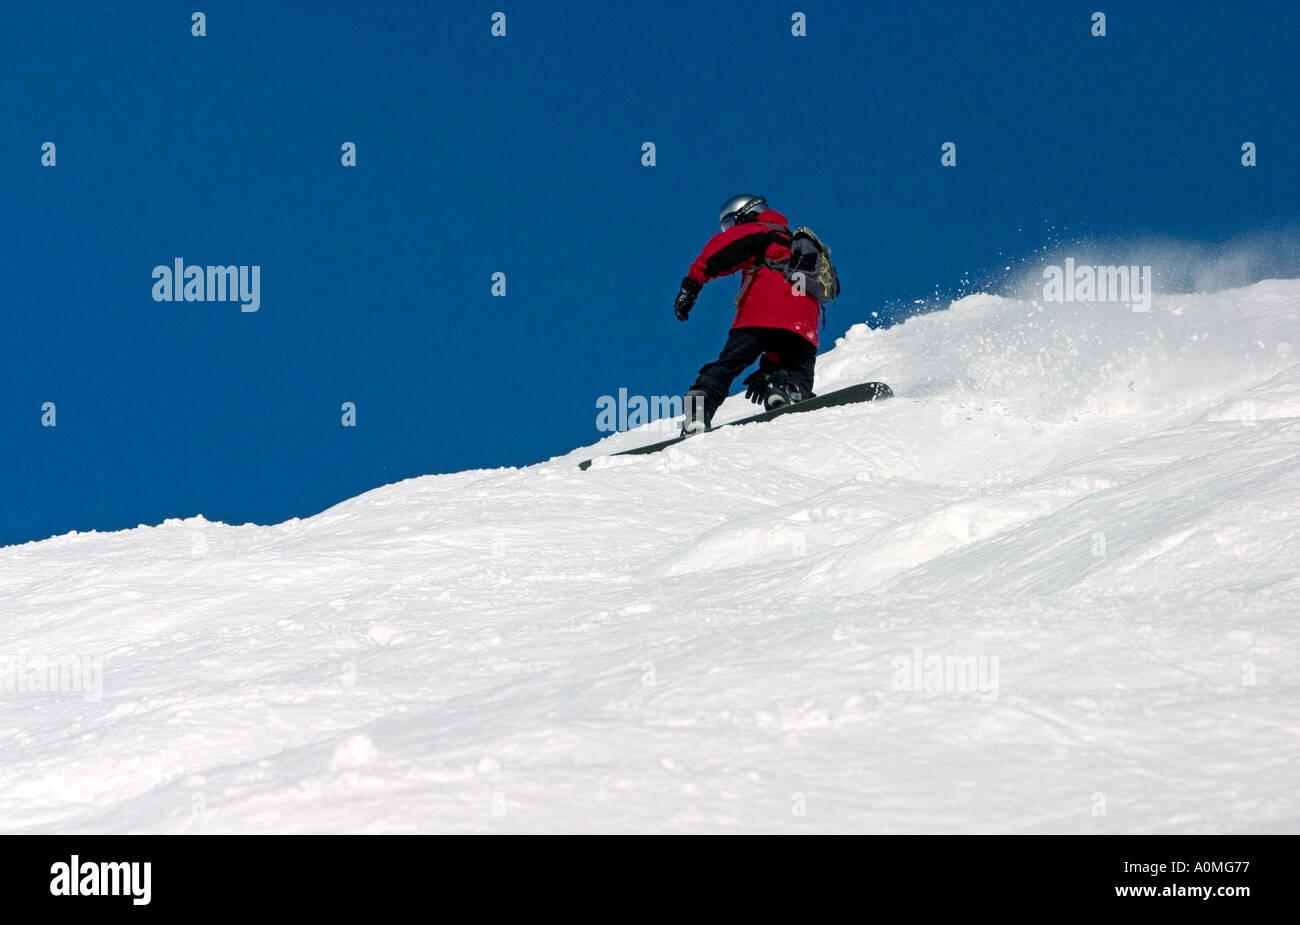 enjoying the ski in grand bornand alps france - Stock Image